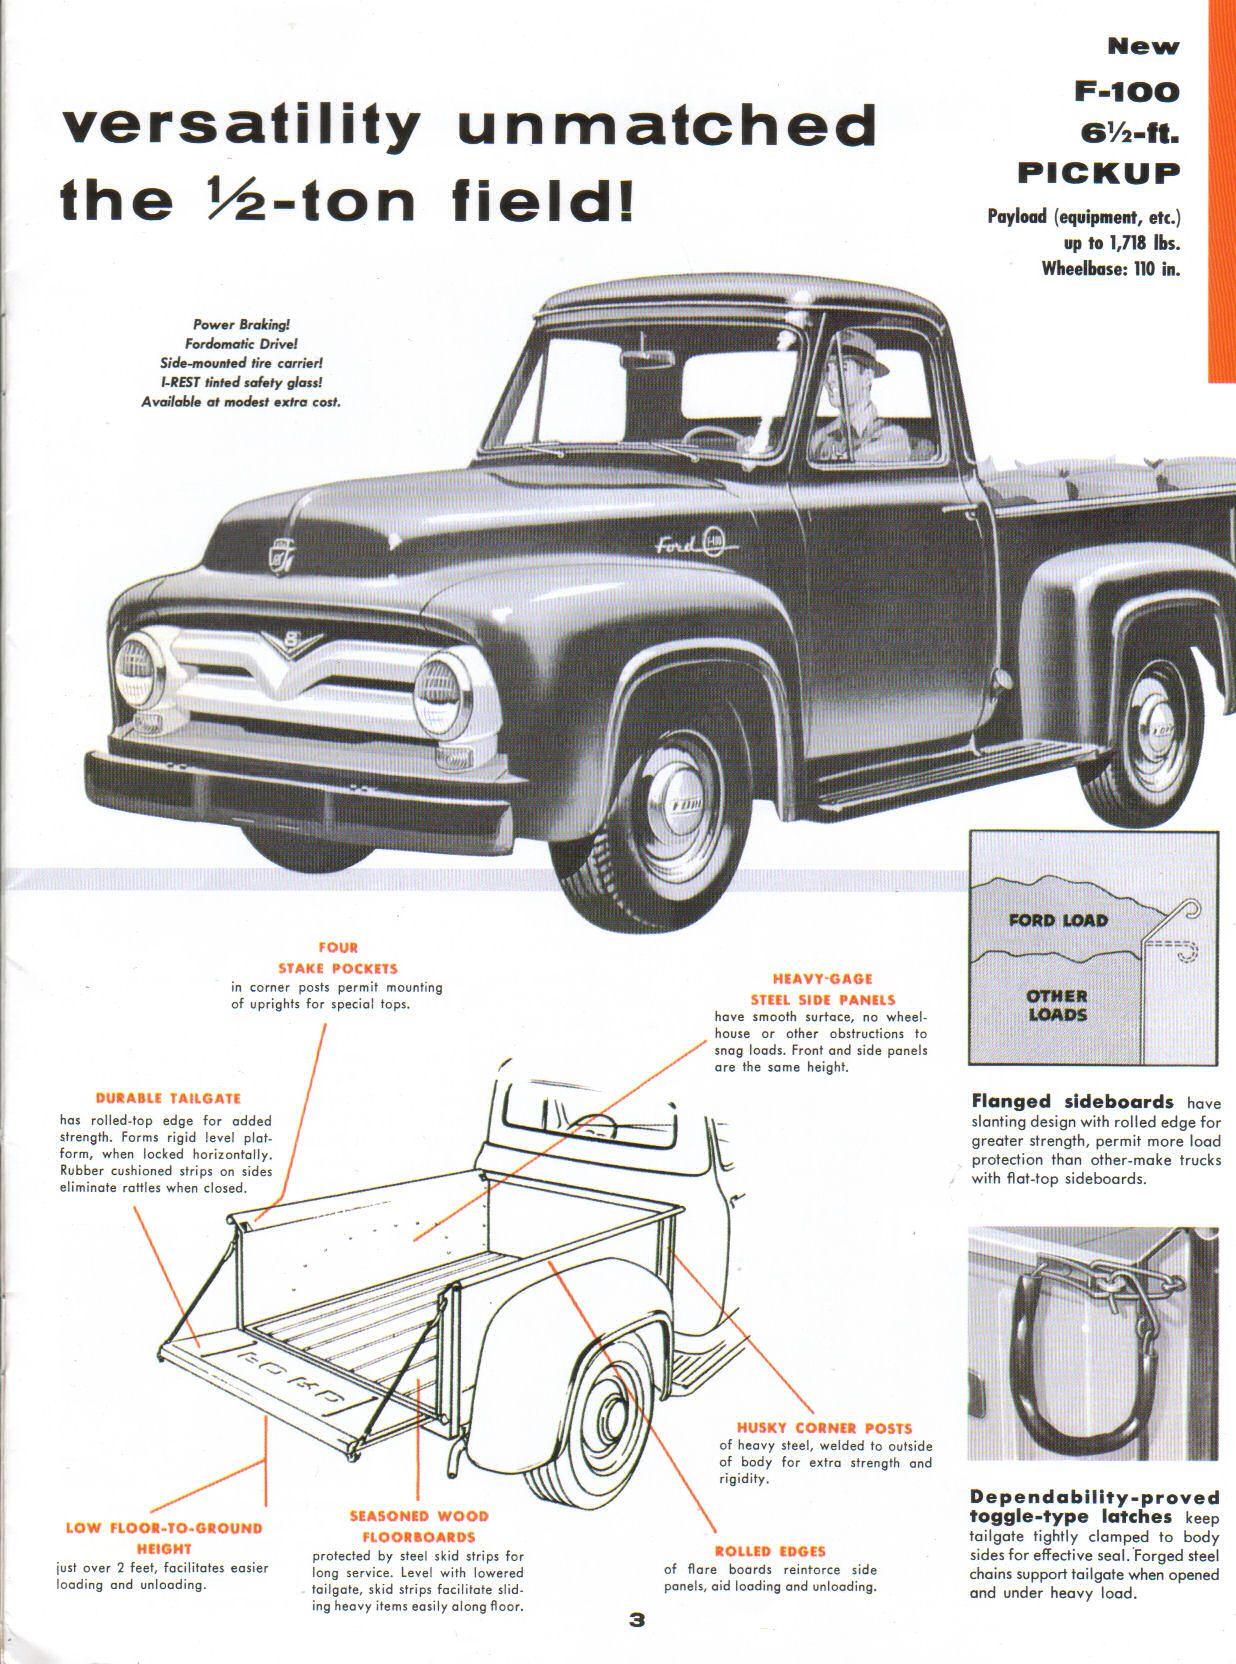 1955 Ford F100 Field | Ford pickup trucks, 1956 ford truck ...1956 Ford F100 Lifted